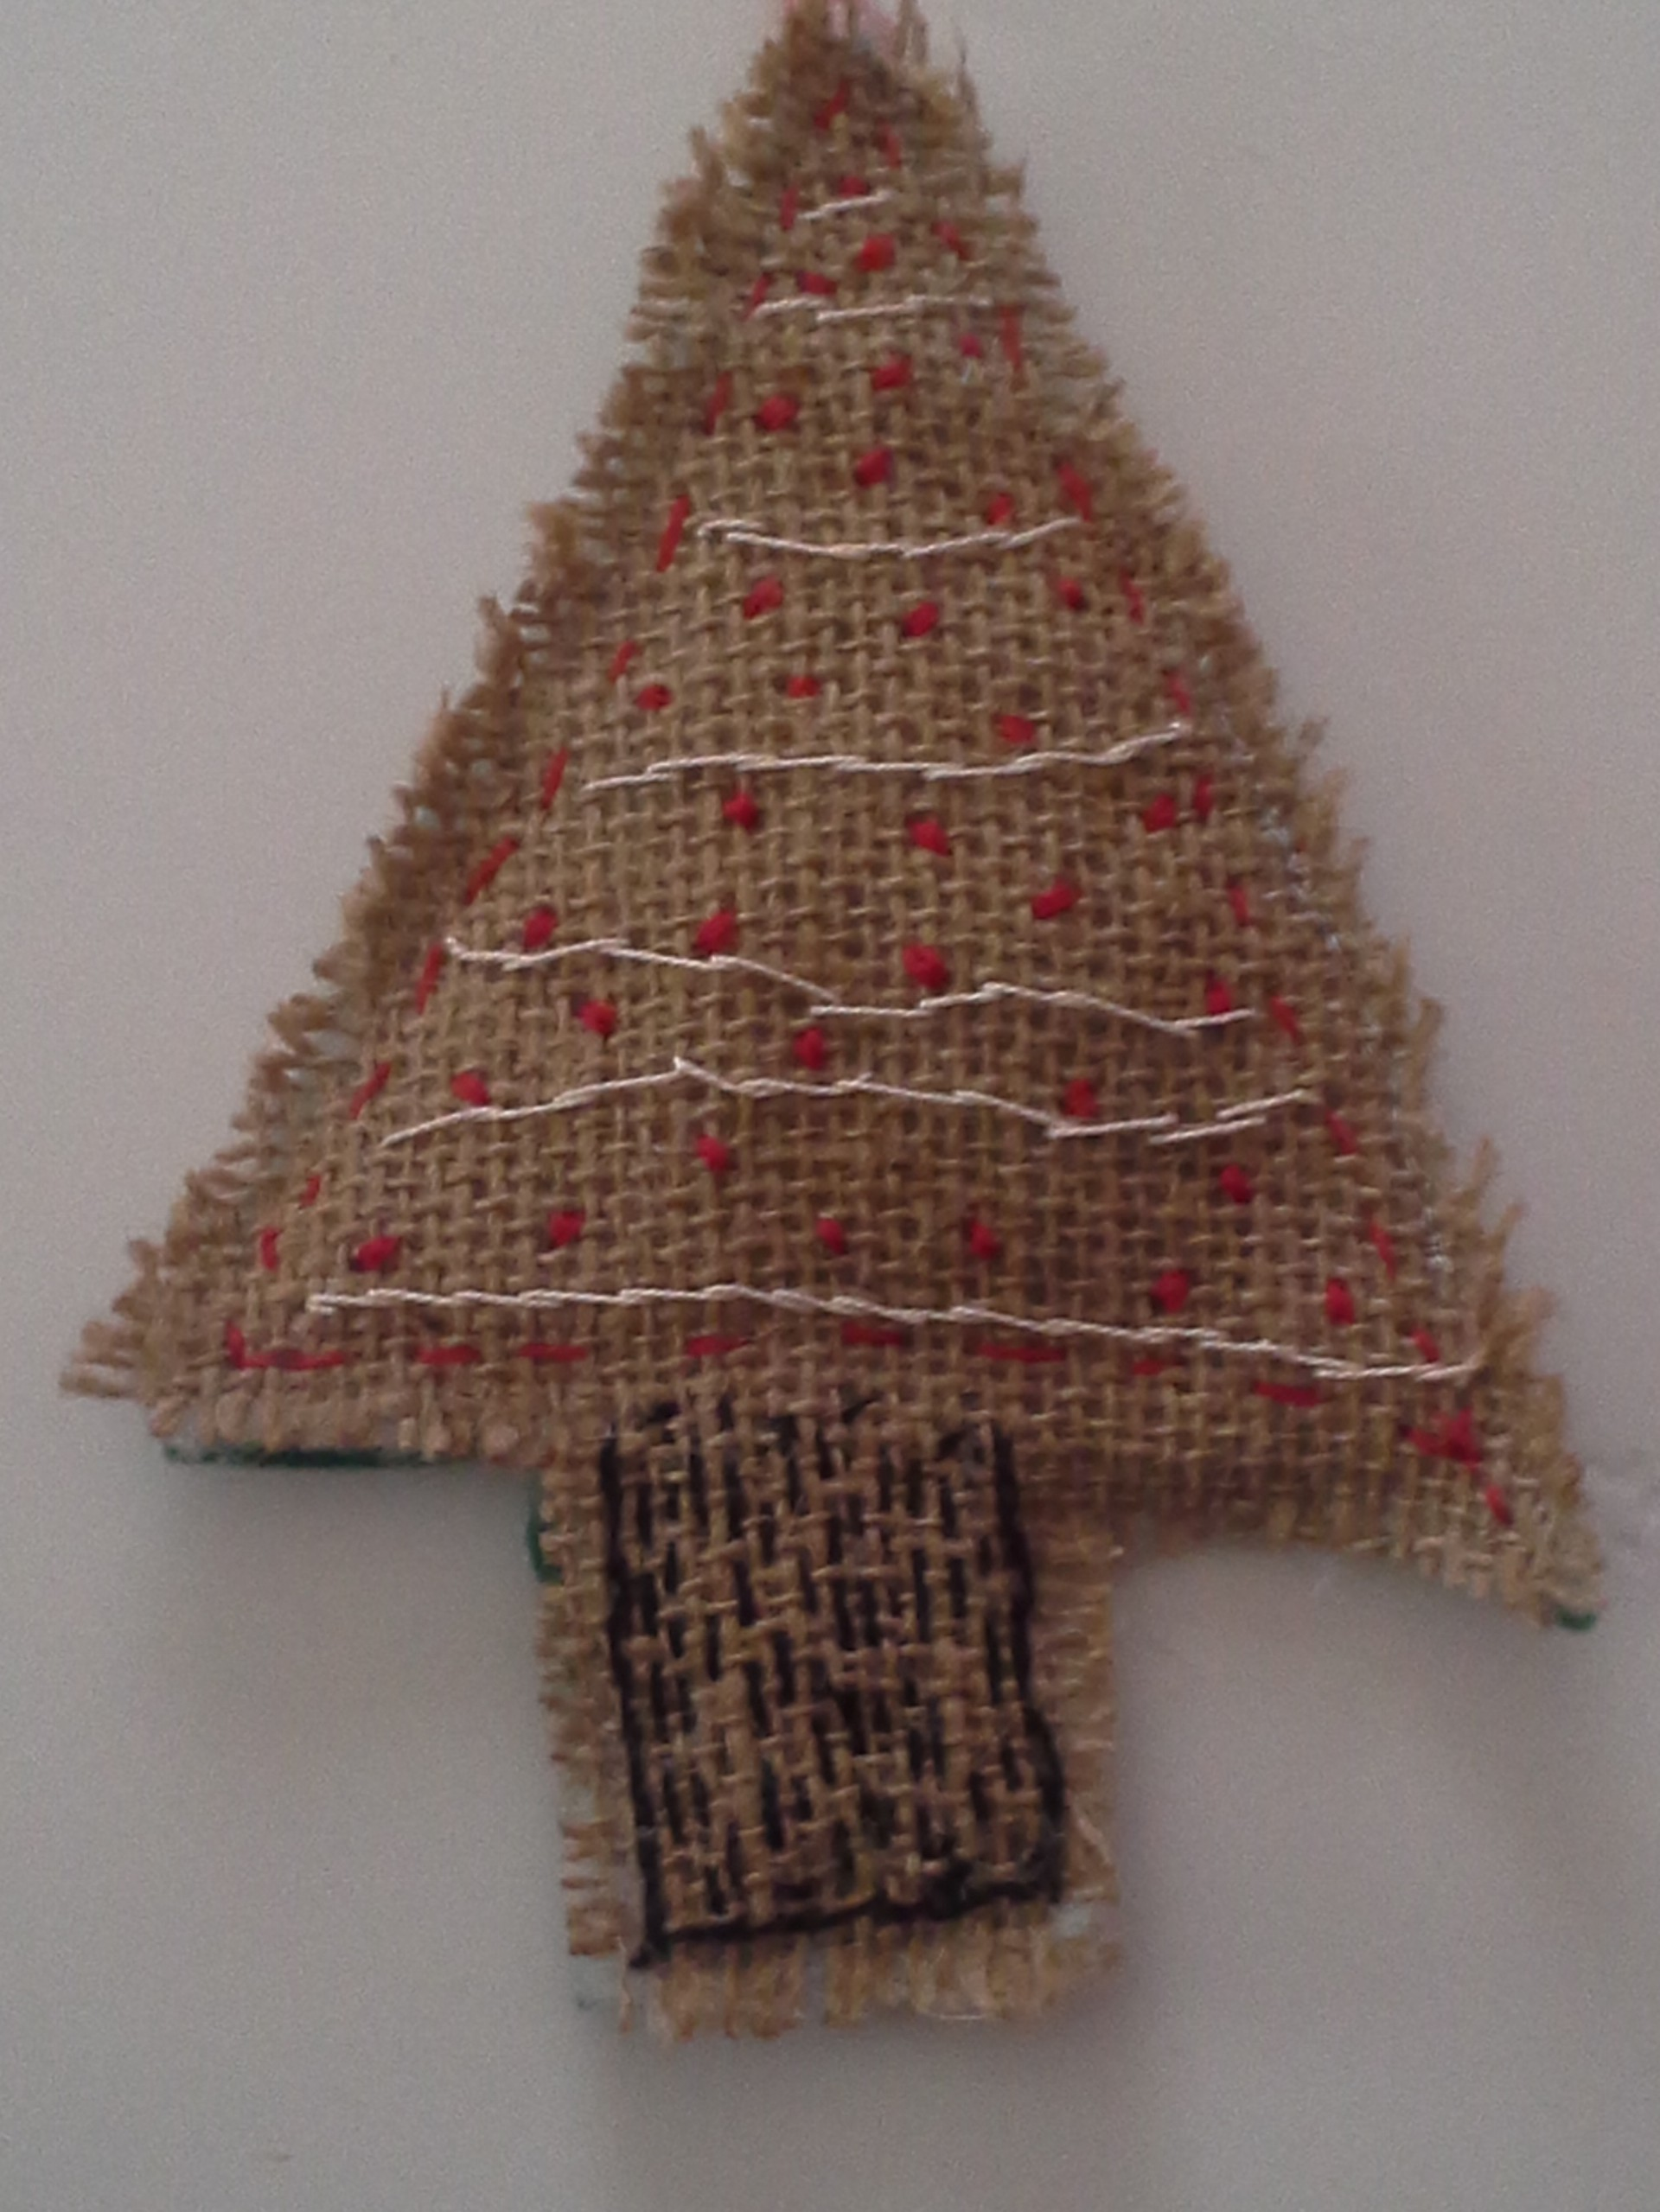 Burlap Tree Ornament   Nita Beshear – A Patchwork Life